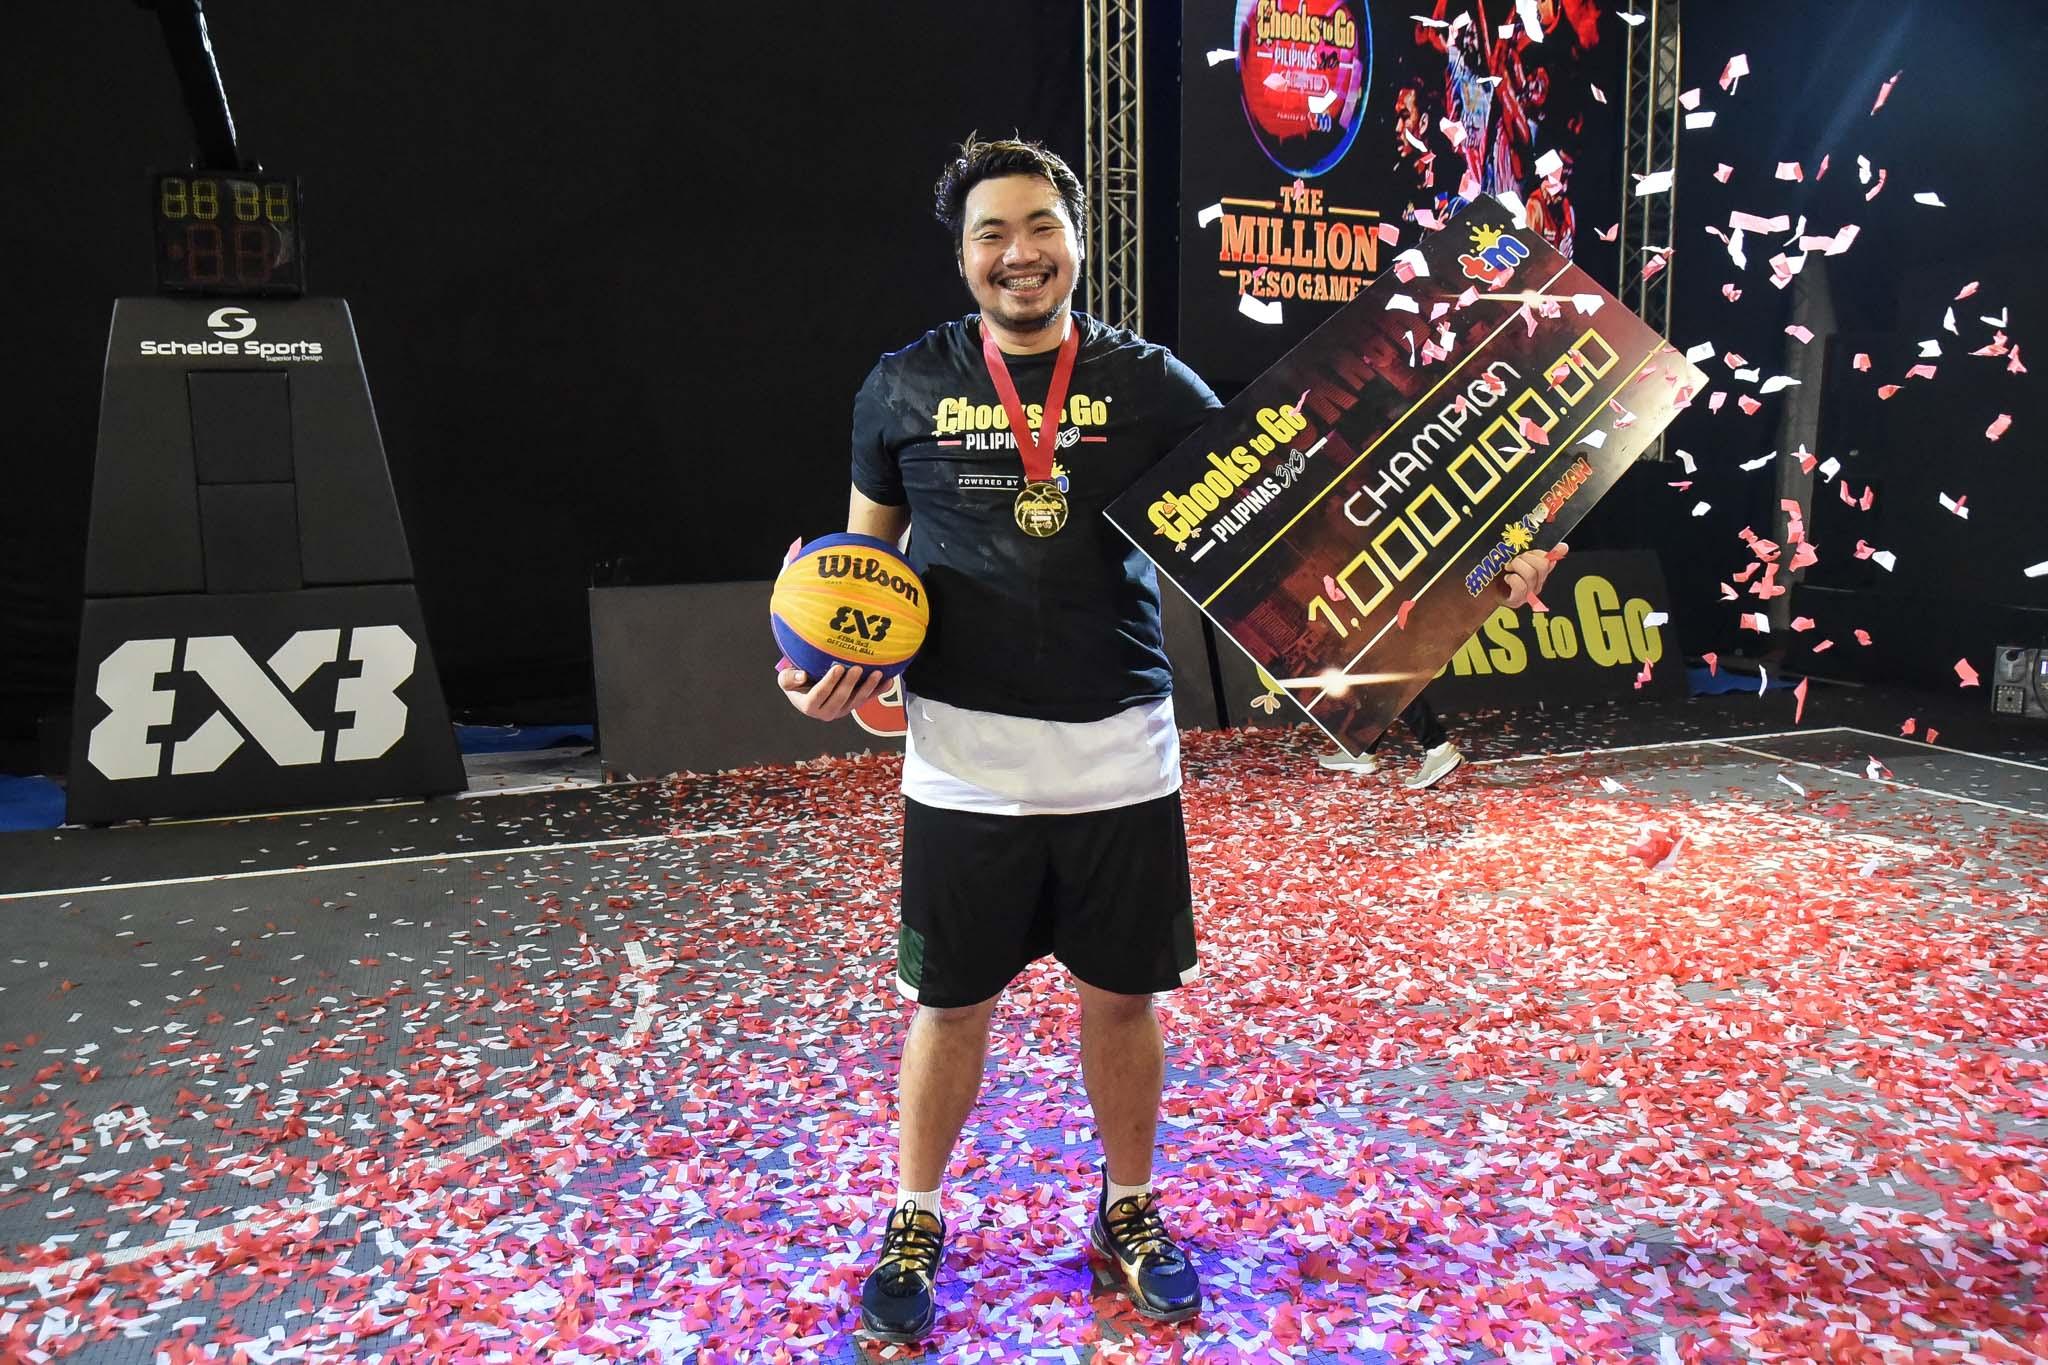 Chooks-to-Go-Pilipinas-3X3-Awarding-Pasaol How will Munzon, Pasaol, Santillan, and Rike spend their P1.35M winnings? 3x3 Basketball Chooks-to-Go Pilipinas 3x3 News  - philippine sports news